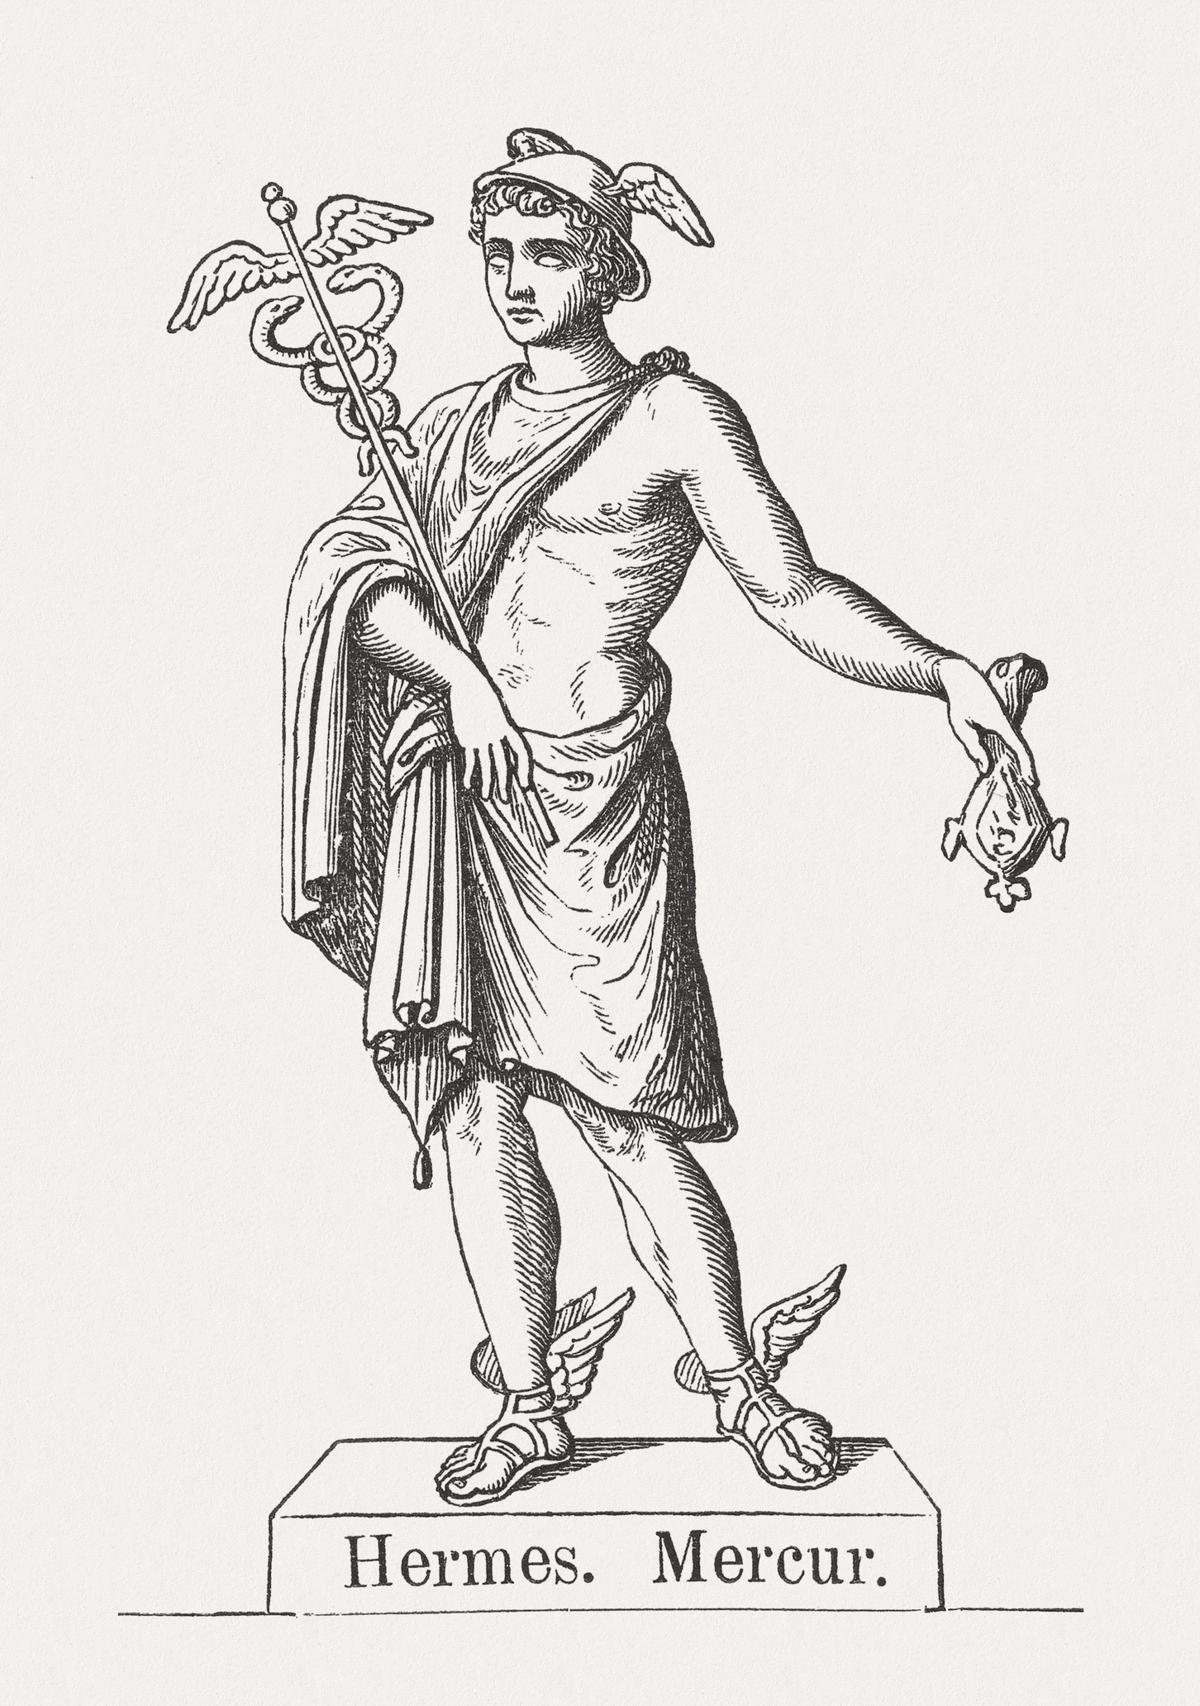 Pluto The Roman God Of The Underworld